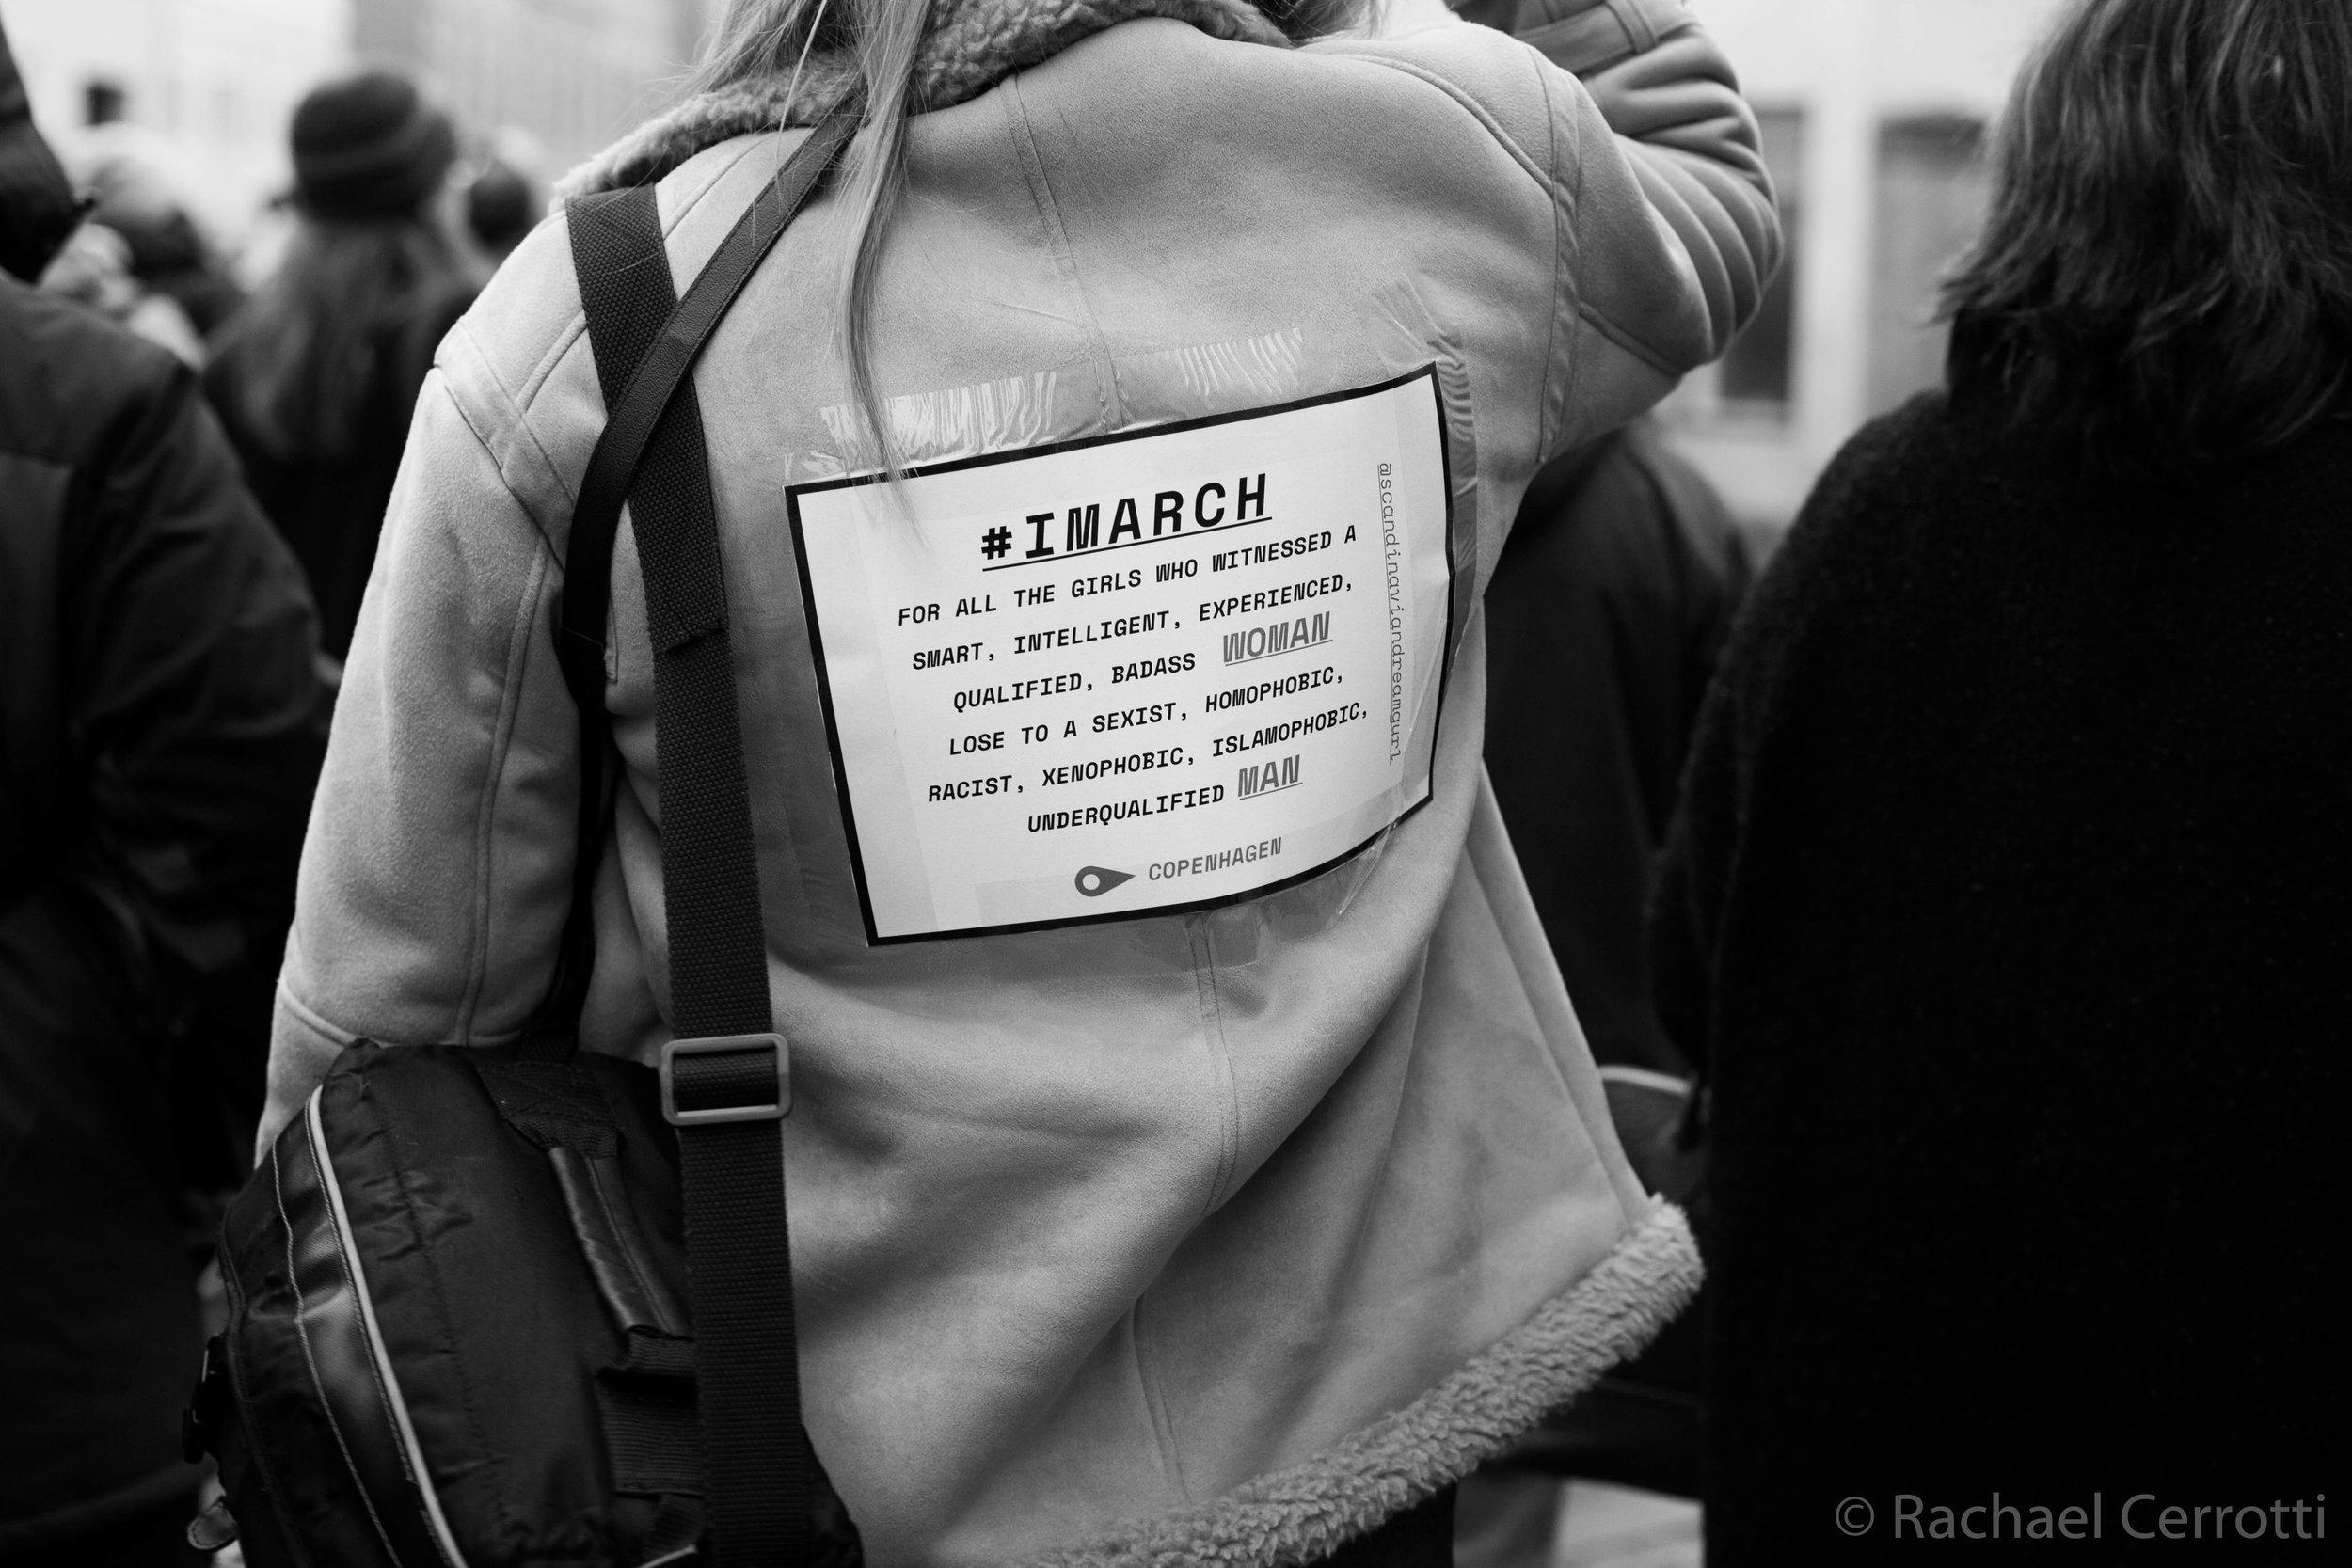 20170121_WomensMarchCPH-006.jpg